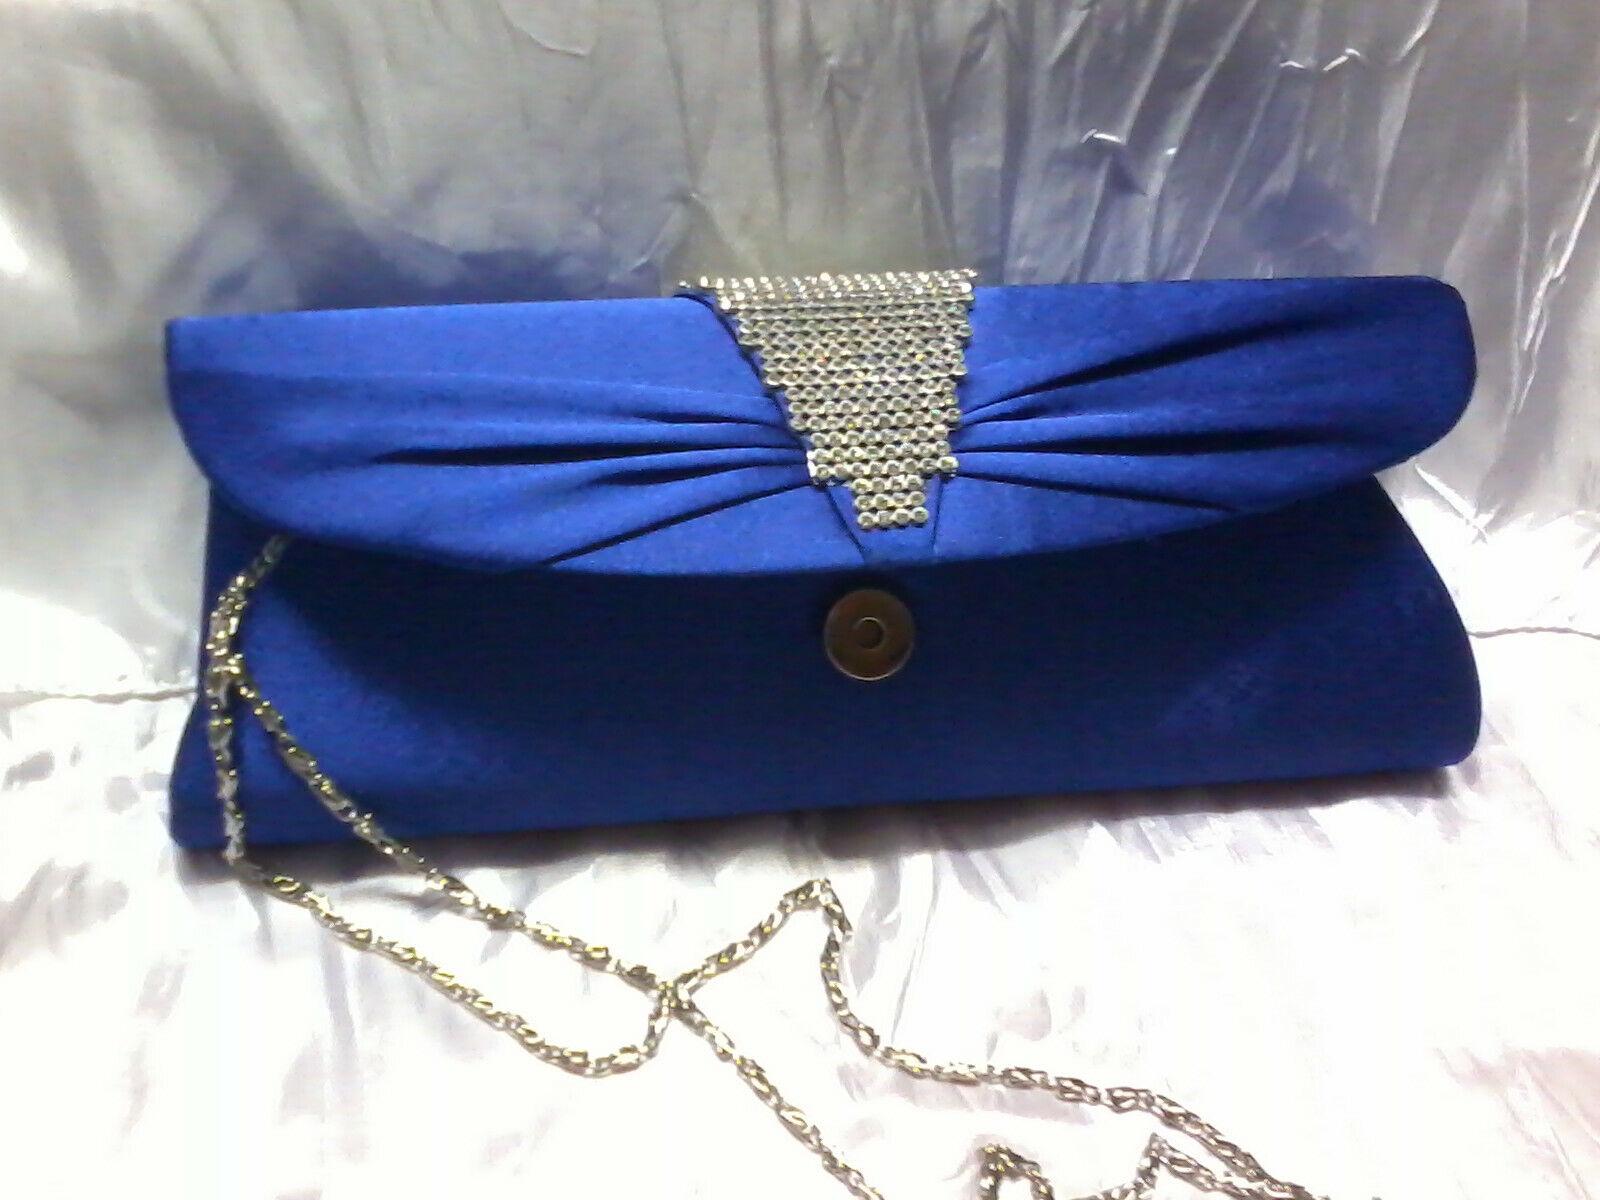 BEAUTIFUL Quality Wedding Evening Wear Clutch HANDBAG PURSE'S hand strap & chain